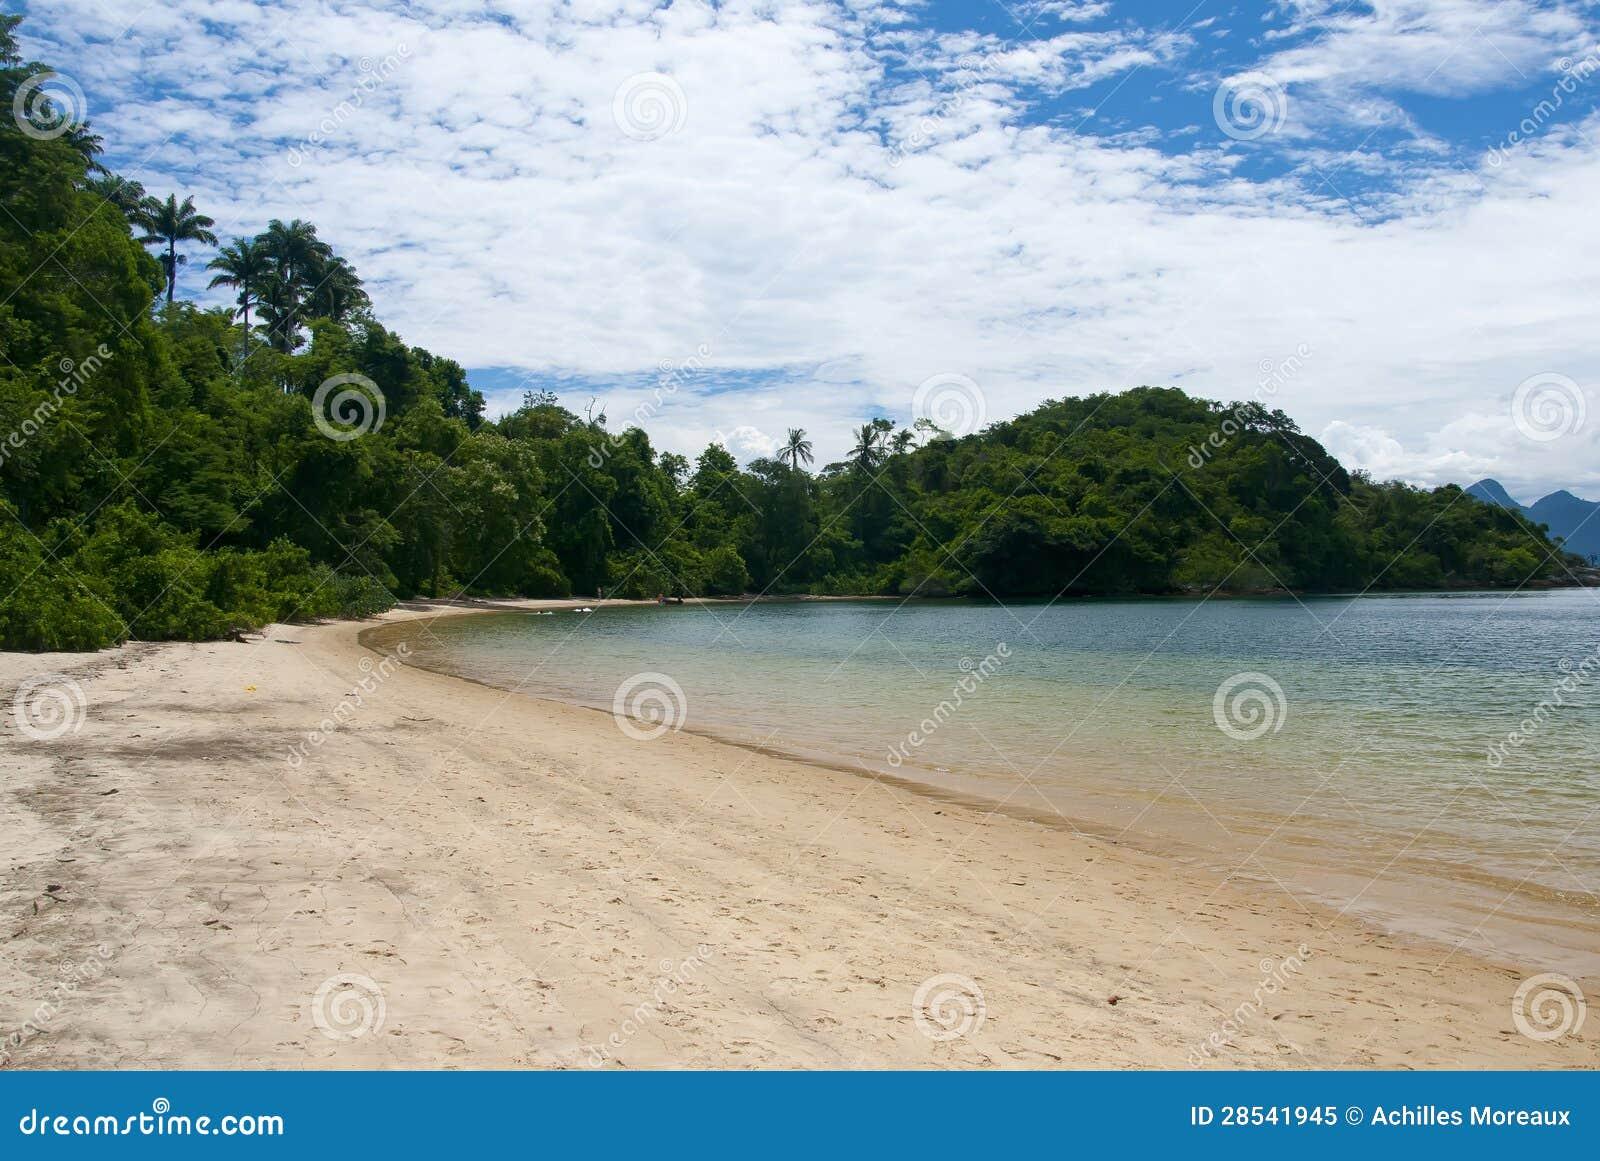 Praia de Tangua